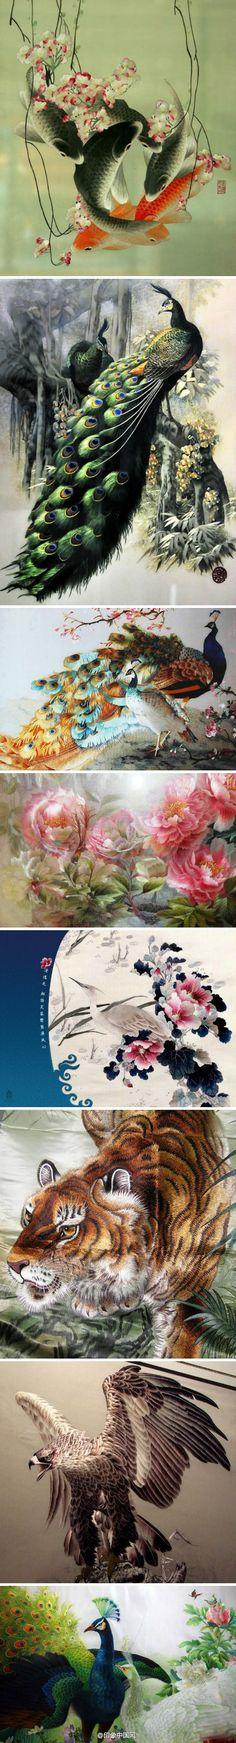 Chinese embroidery has developed since HanDynasty about 250BC..9b699878jw1e9g3yokpdjj20c82ib7qr.jpg 440×3 251 pixels